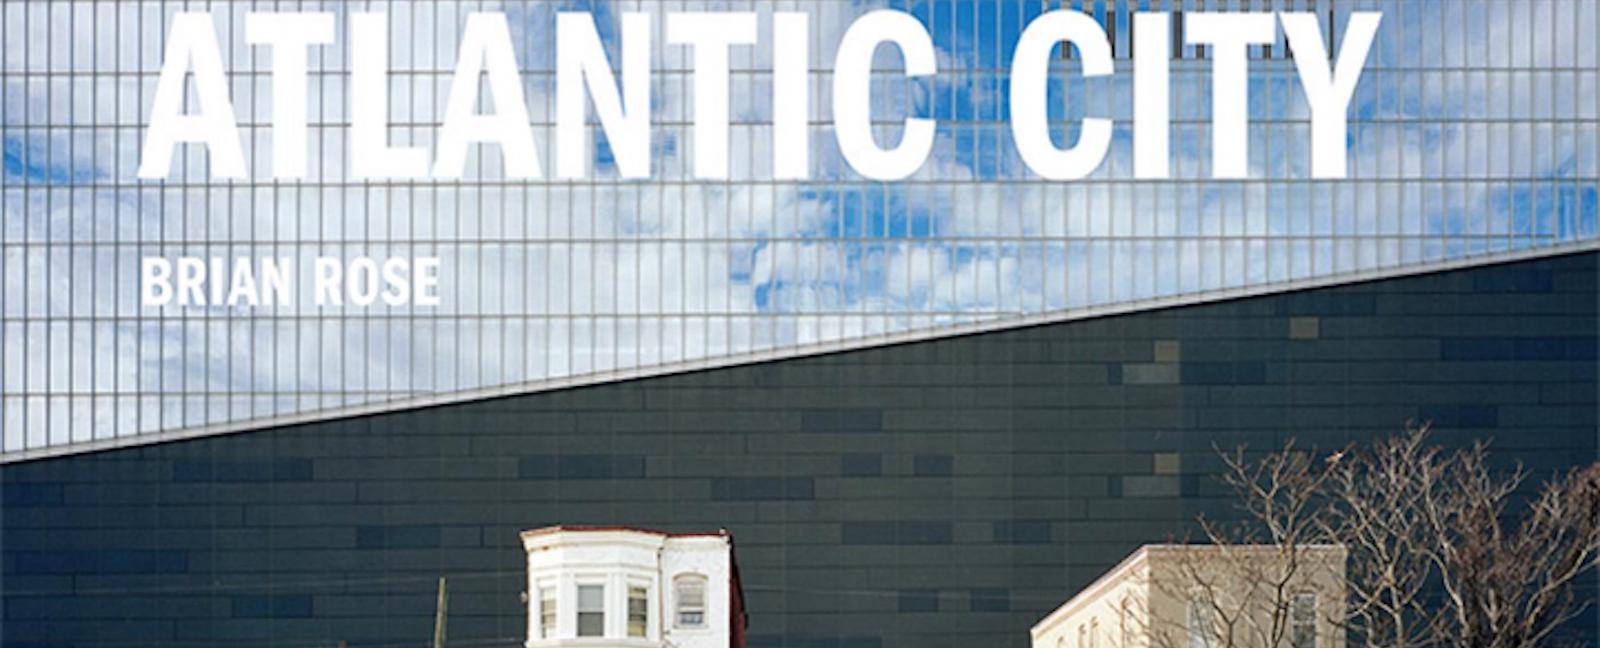 Atlantic-City-Cover-720x575.jpg